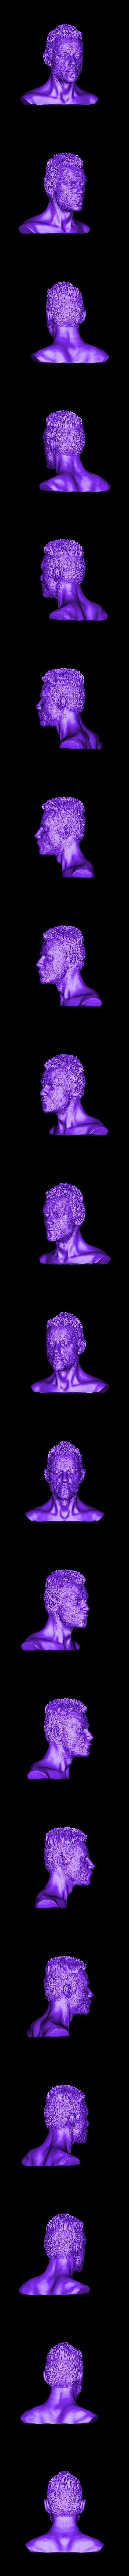 MR.stl Download free STL file Elliot (Mr. Robot)  Rami Malek • 3D printer object, Boris3dStudio